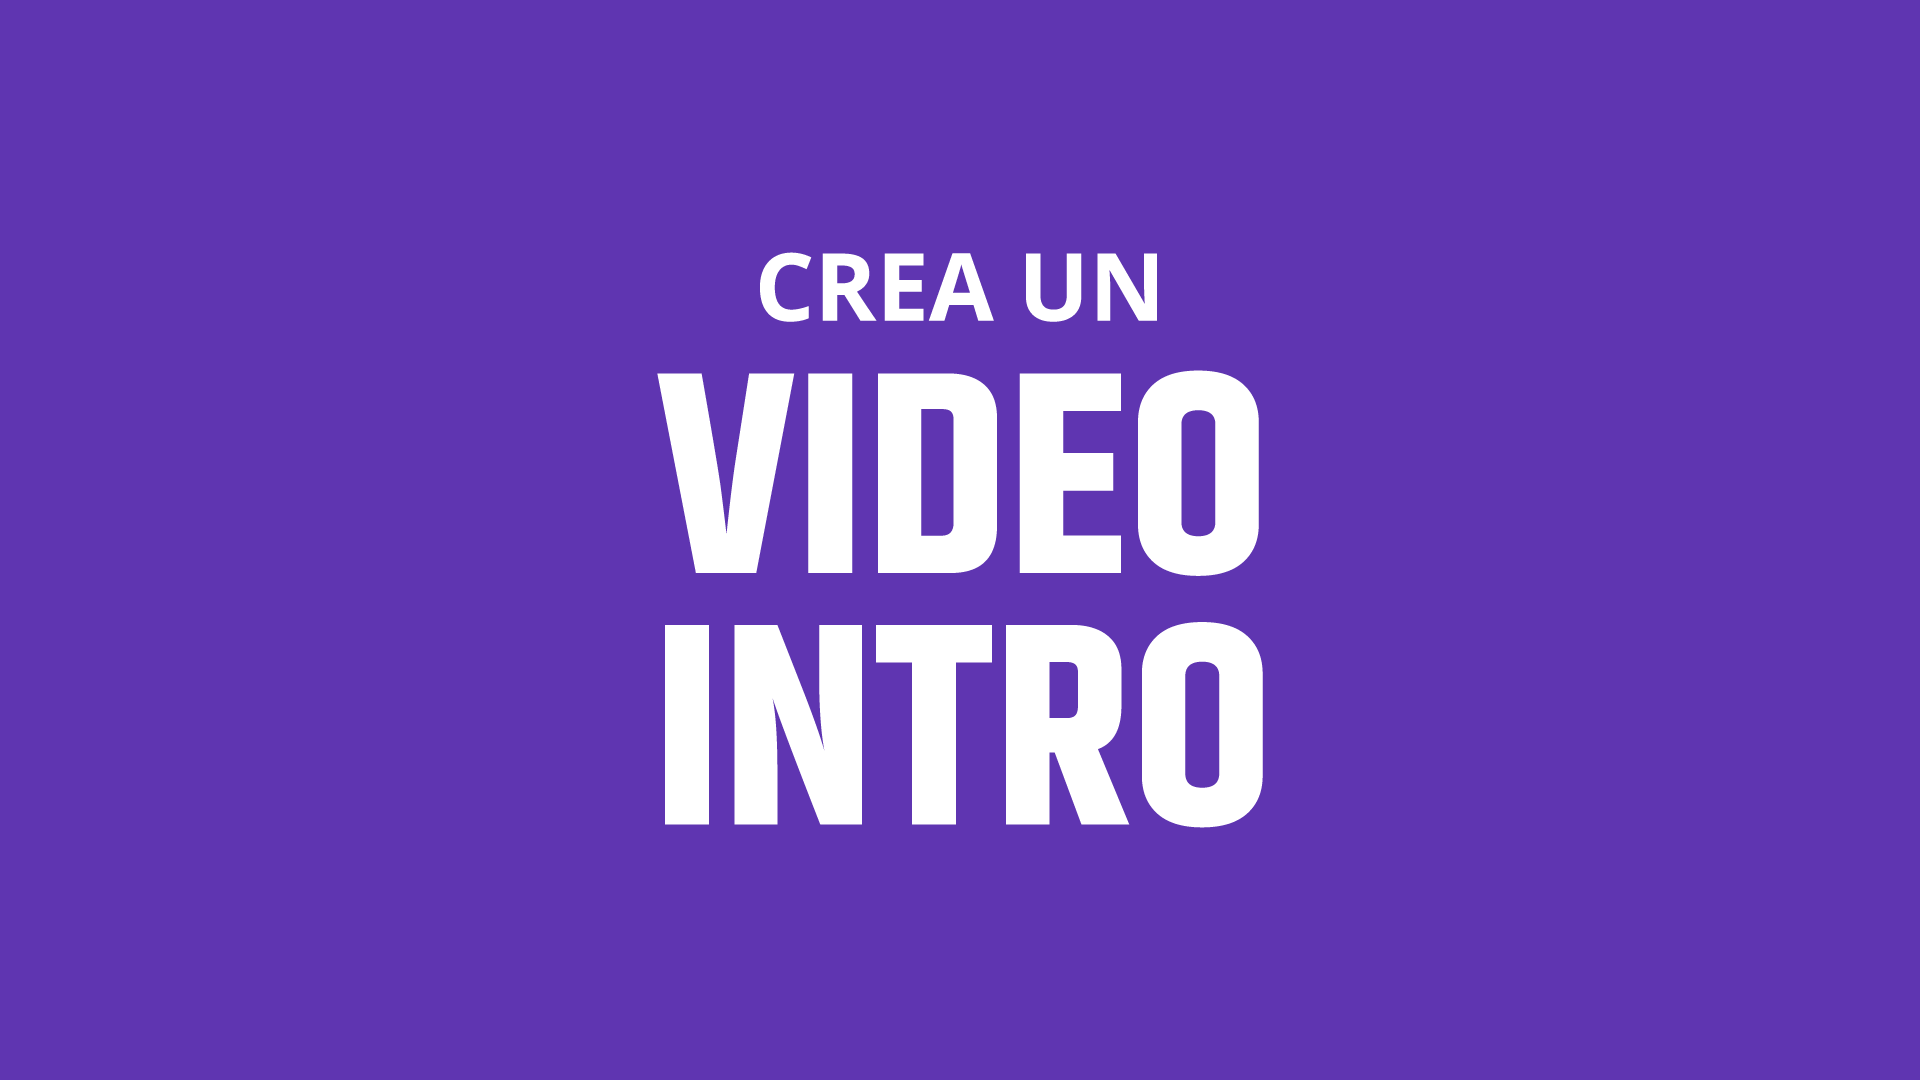 video intro & outro service for videos.